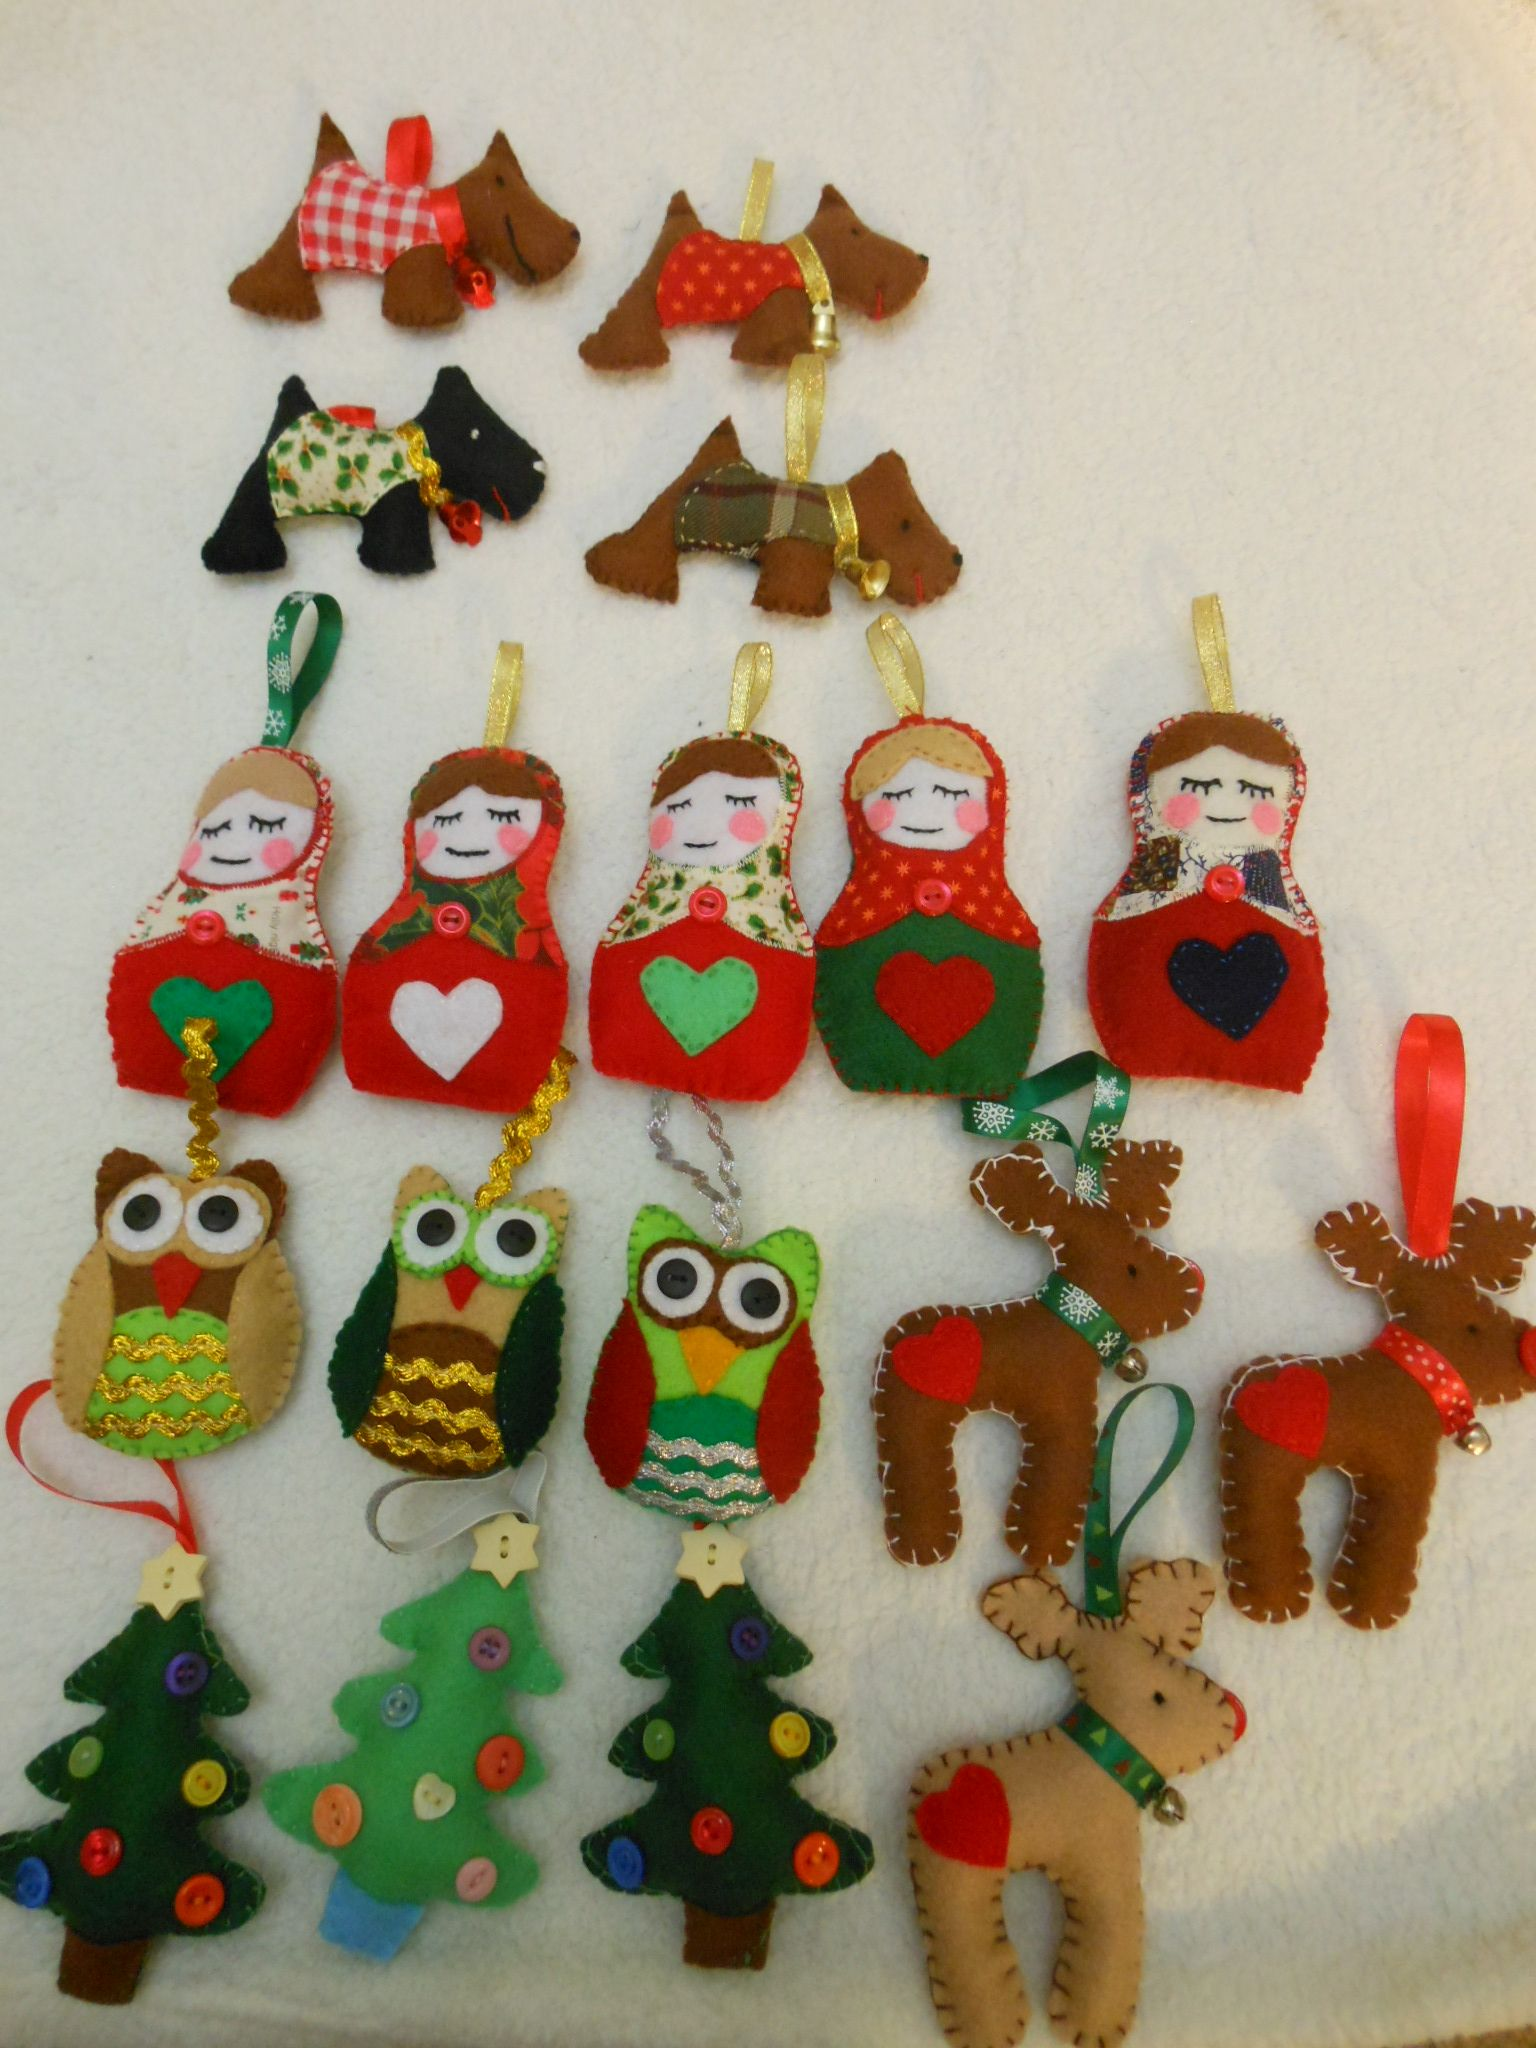 A Range Or Christmas Decor Christmas Decorations Christmas Ornaments Decor